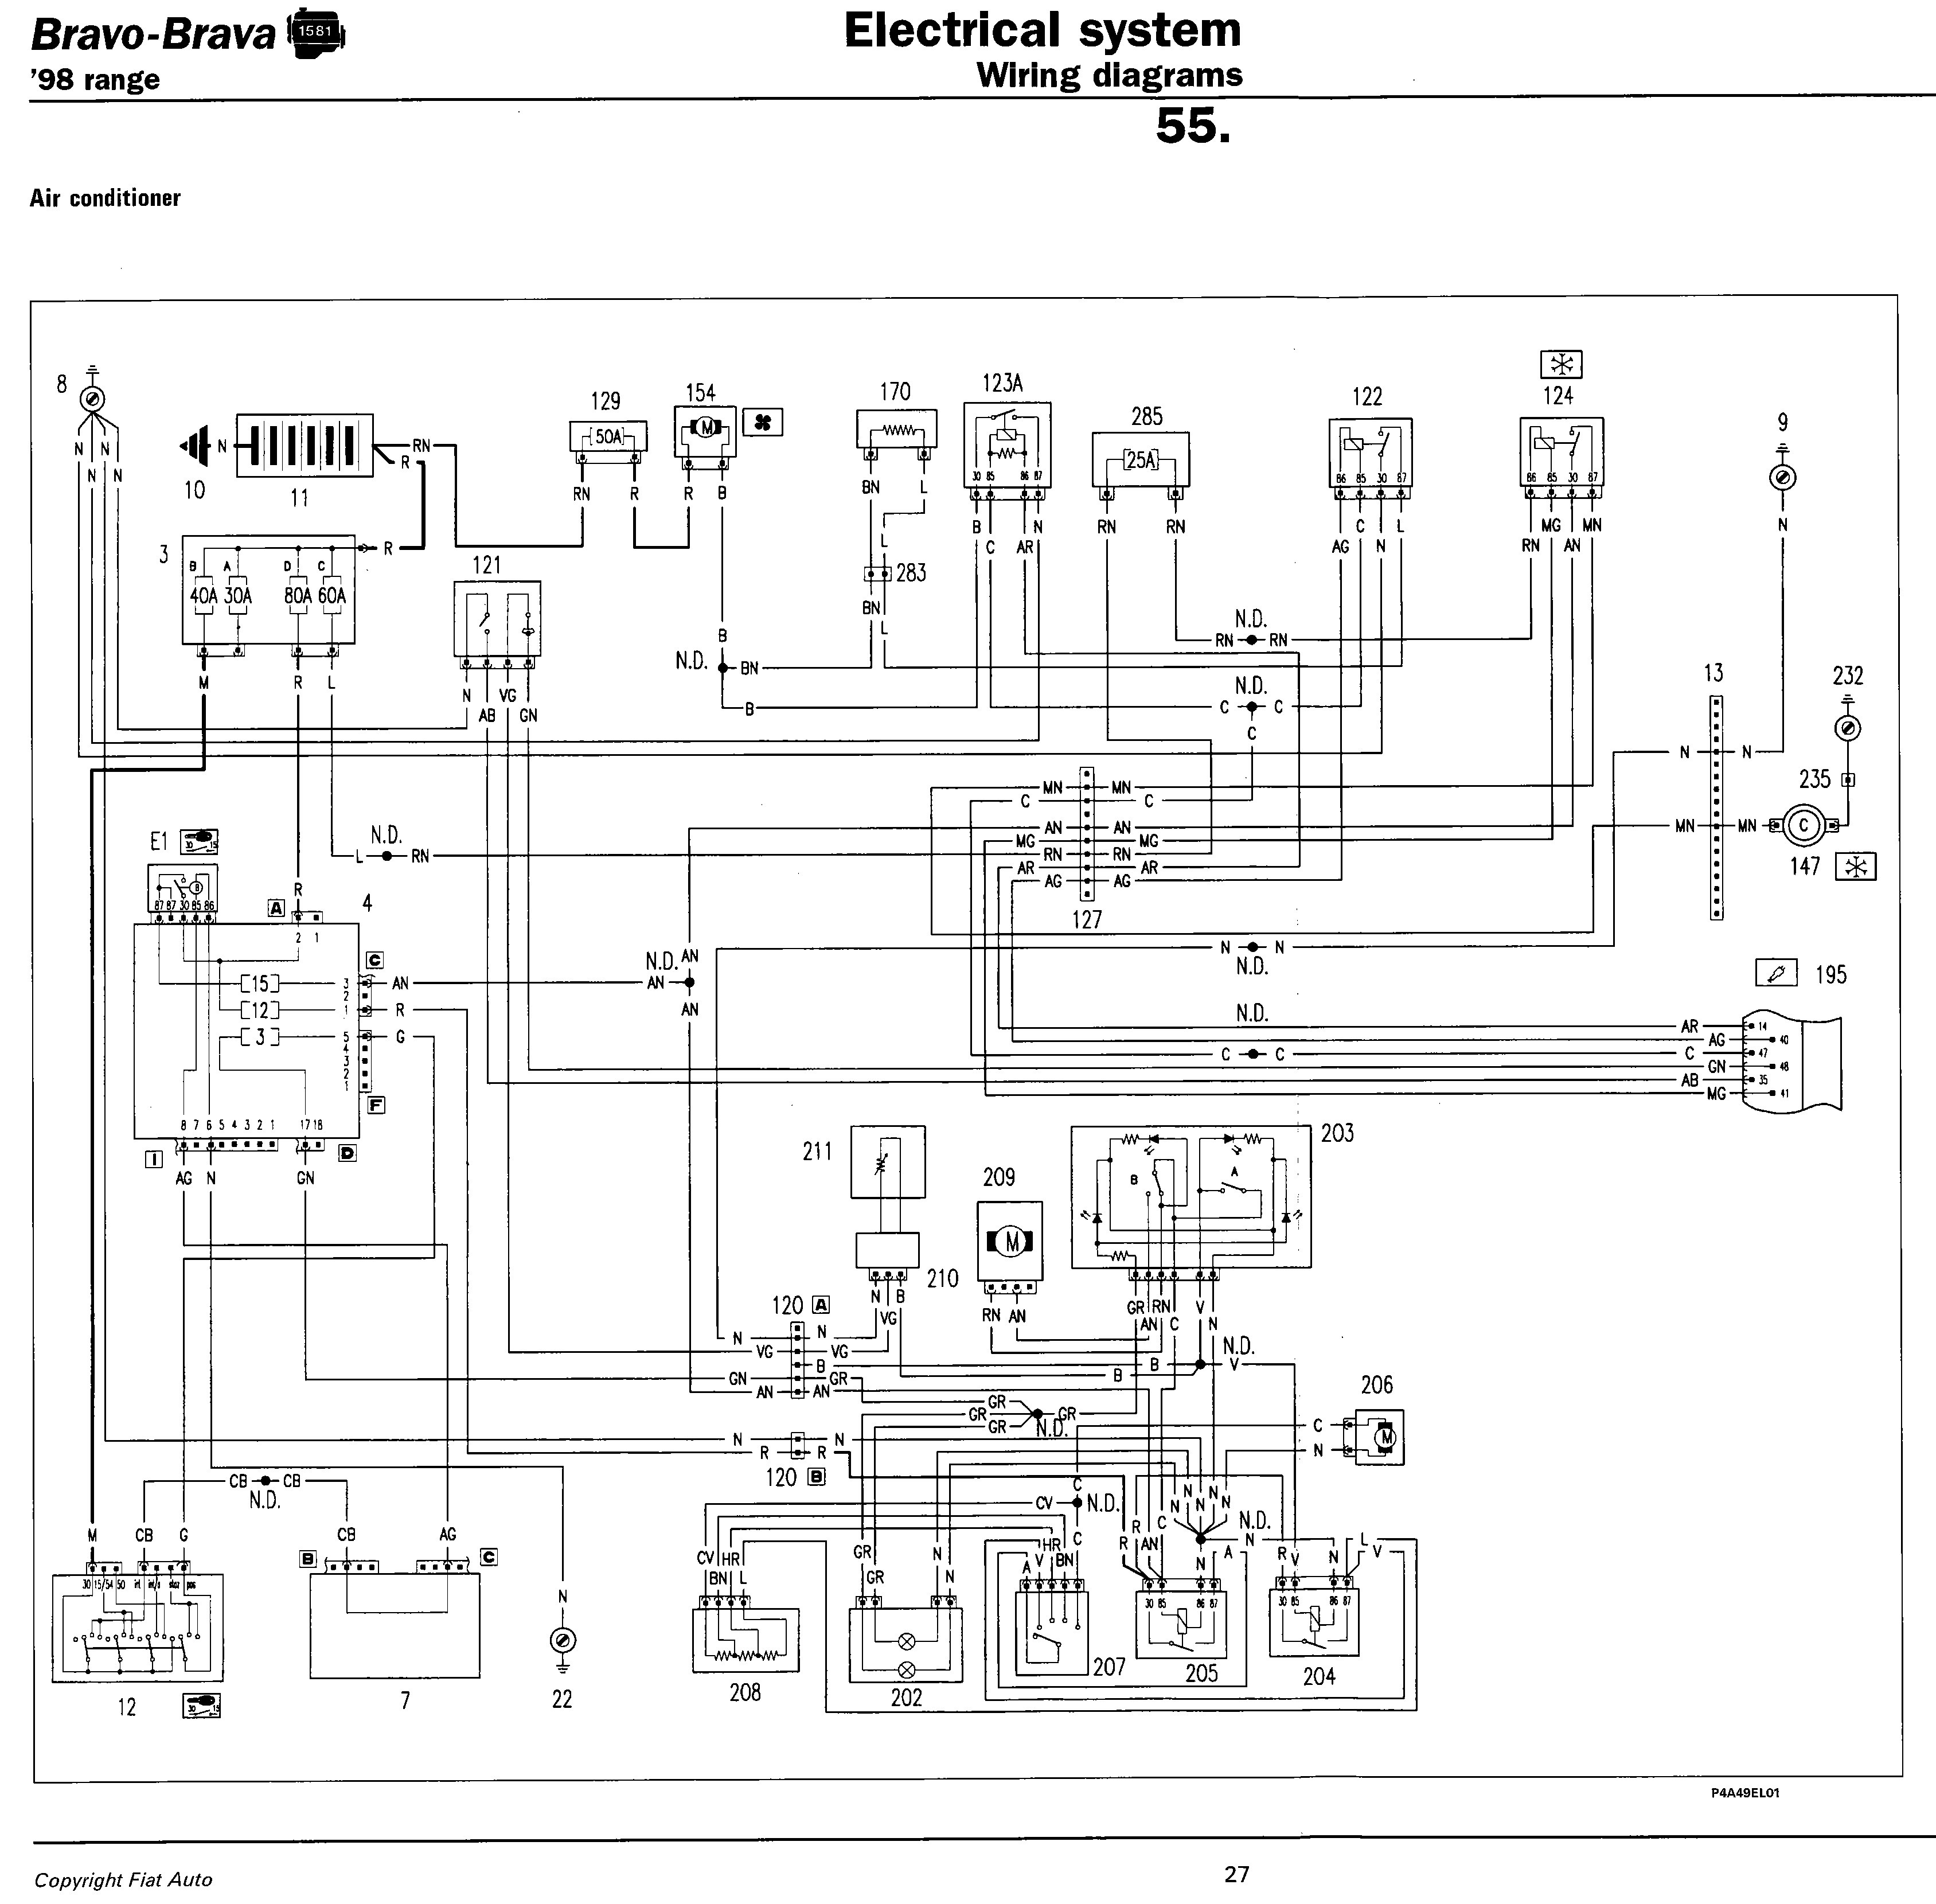 Wondrous Furnace Wiring Box Wiring Diagram Wiring Cloud Onicaalyptbenolwigegmohammedshrineorg